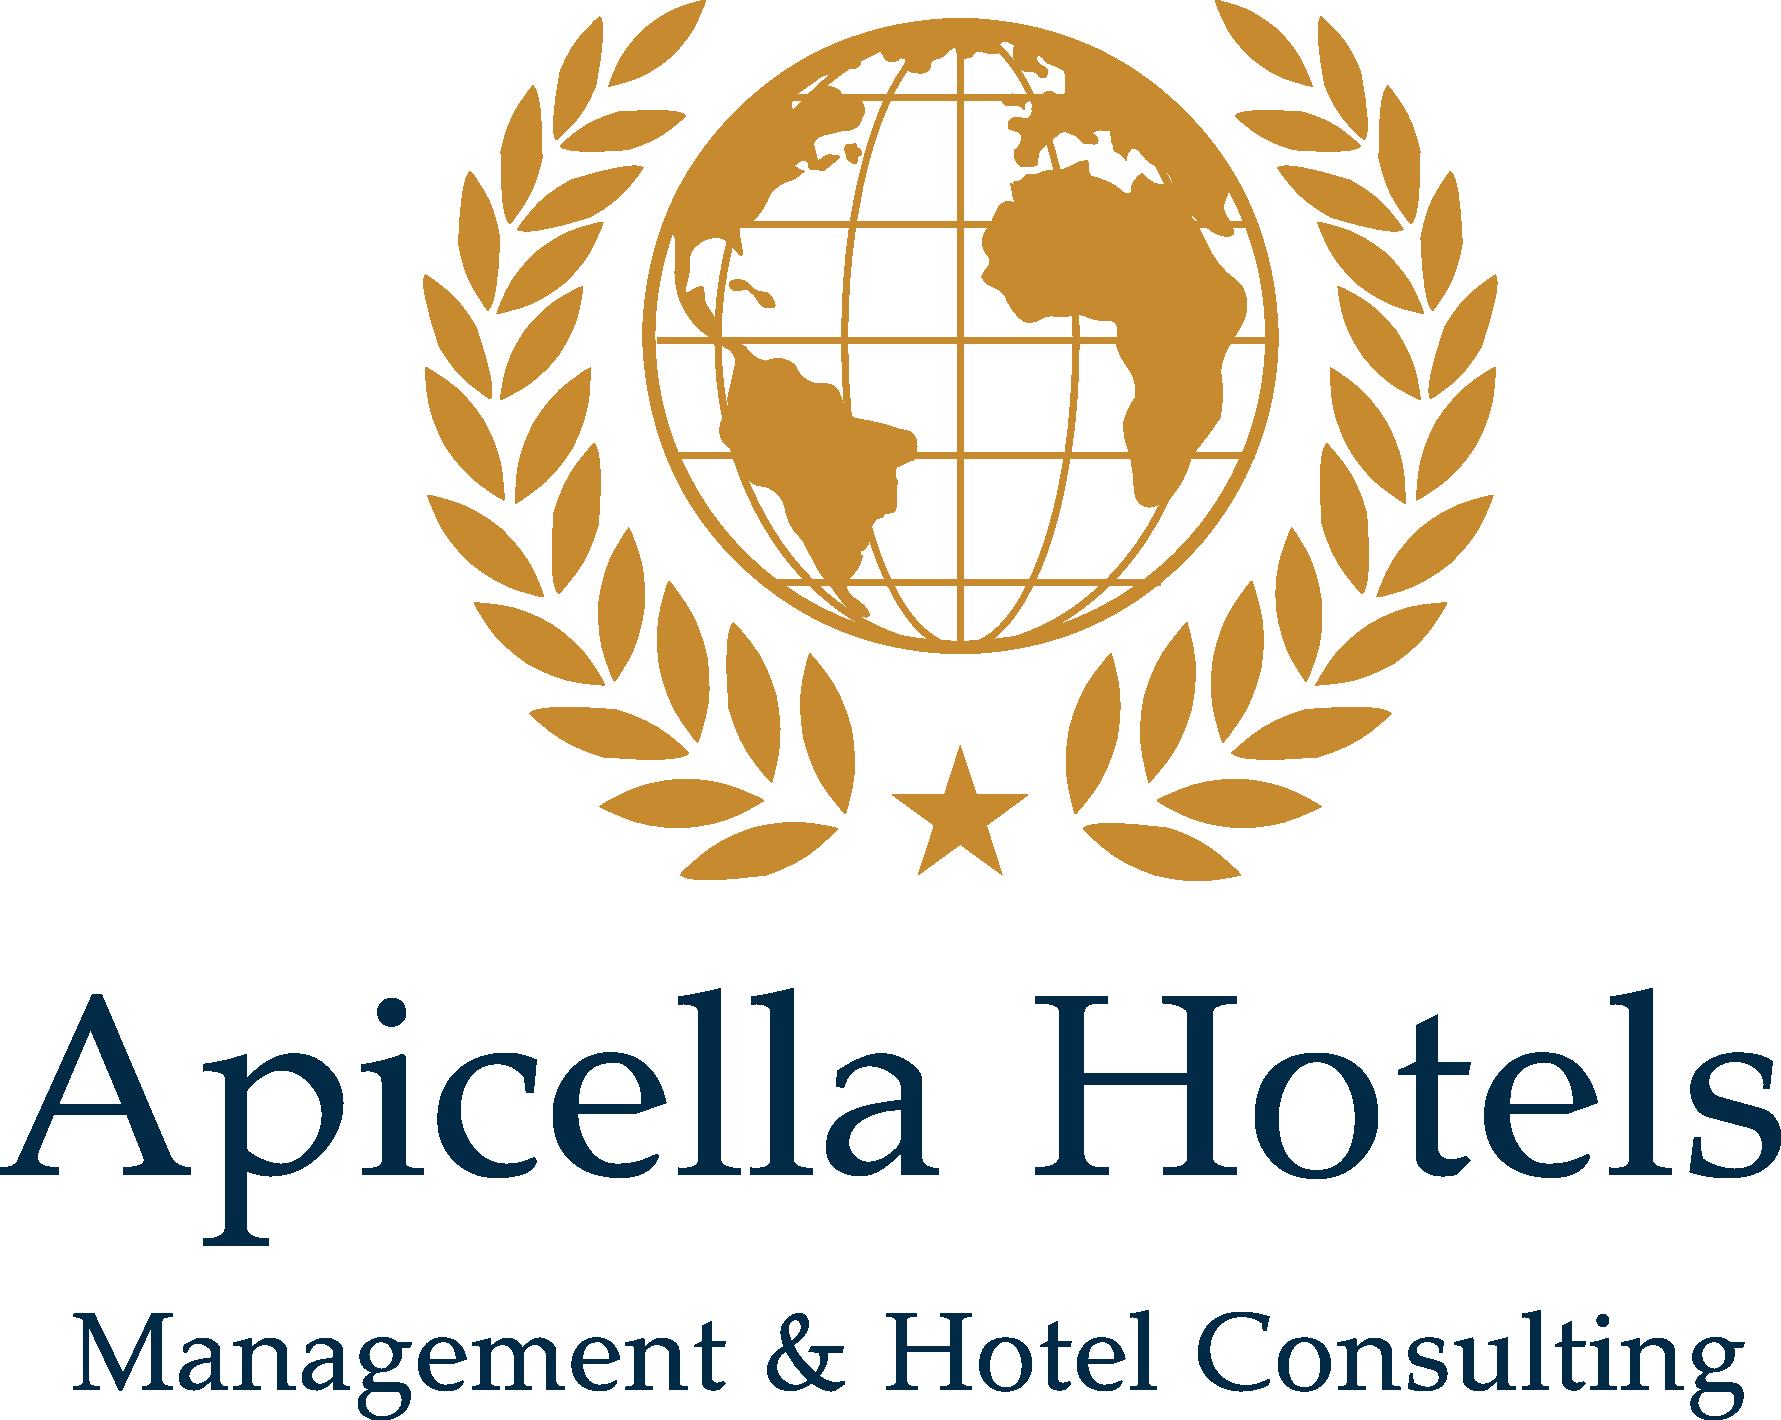 Apicella Hotels